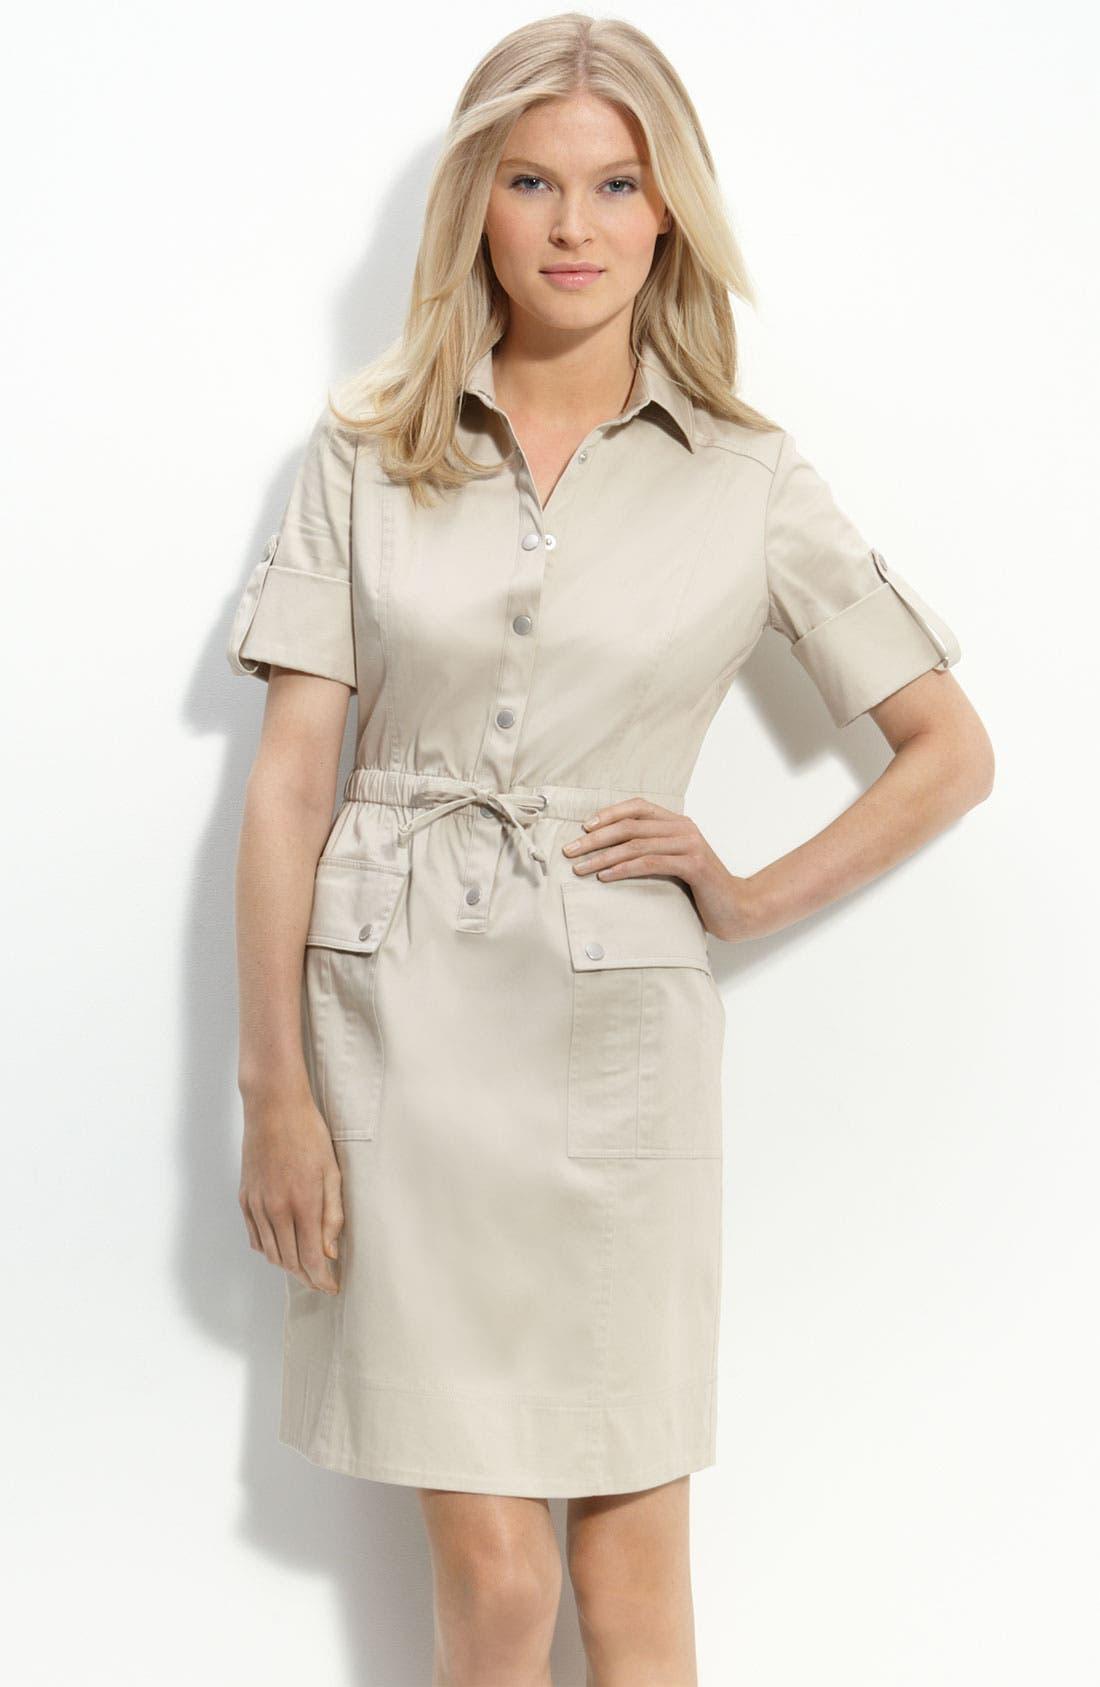 Alternate Image 1 Selected - Calvin Klein Drawstring Waist Stretch Cotton Shirtdress